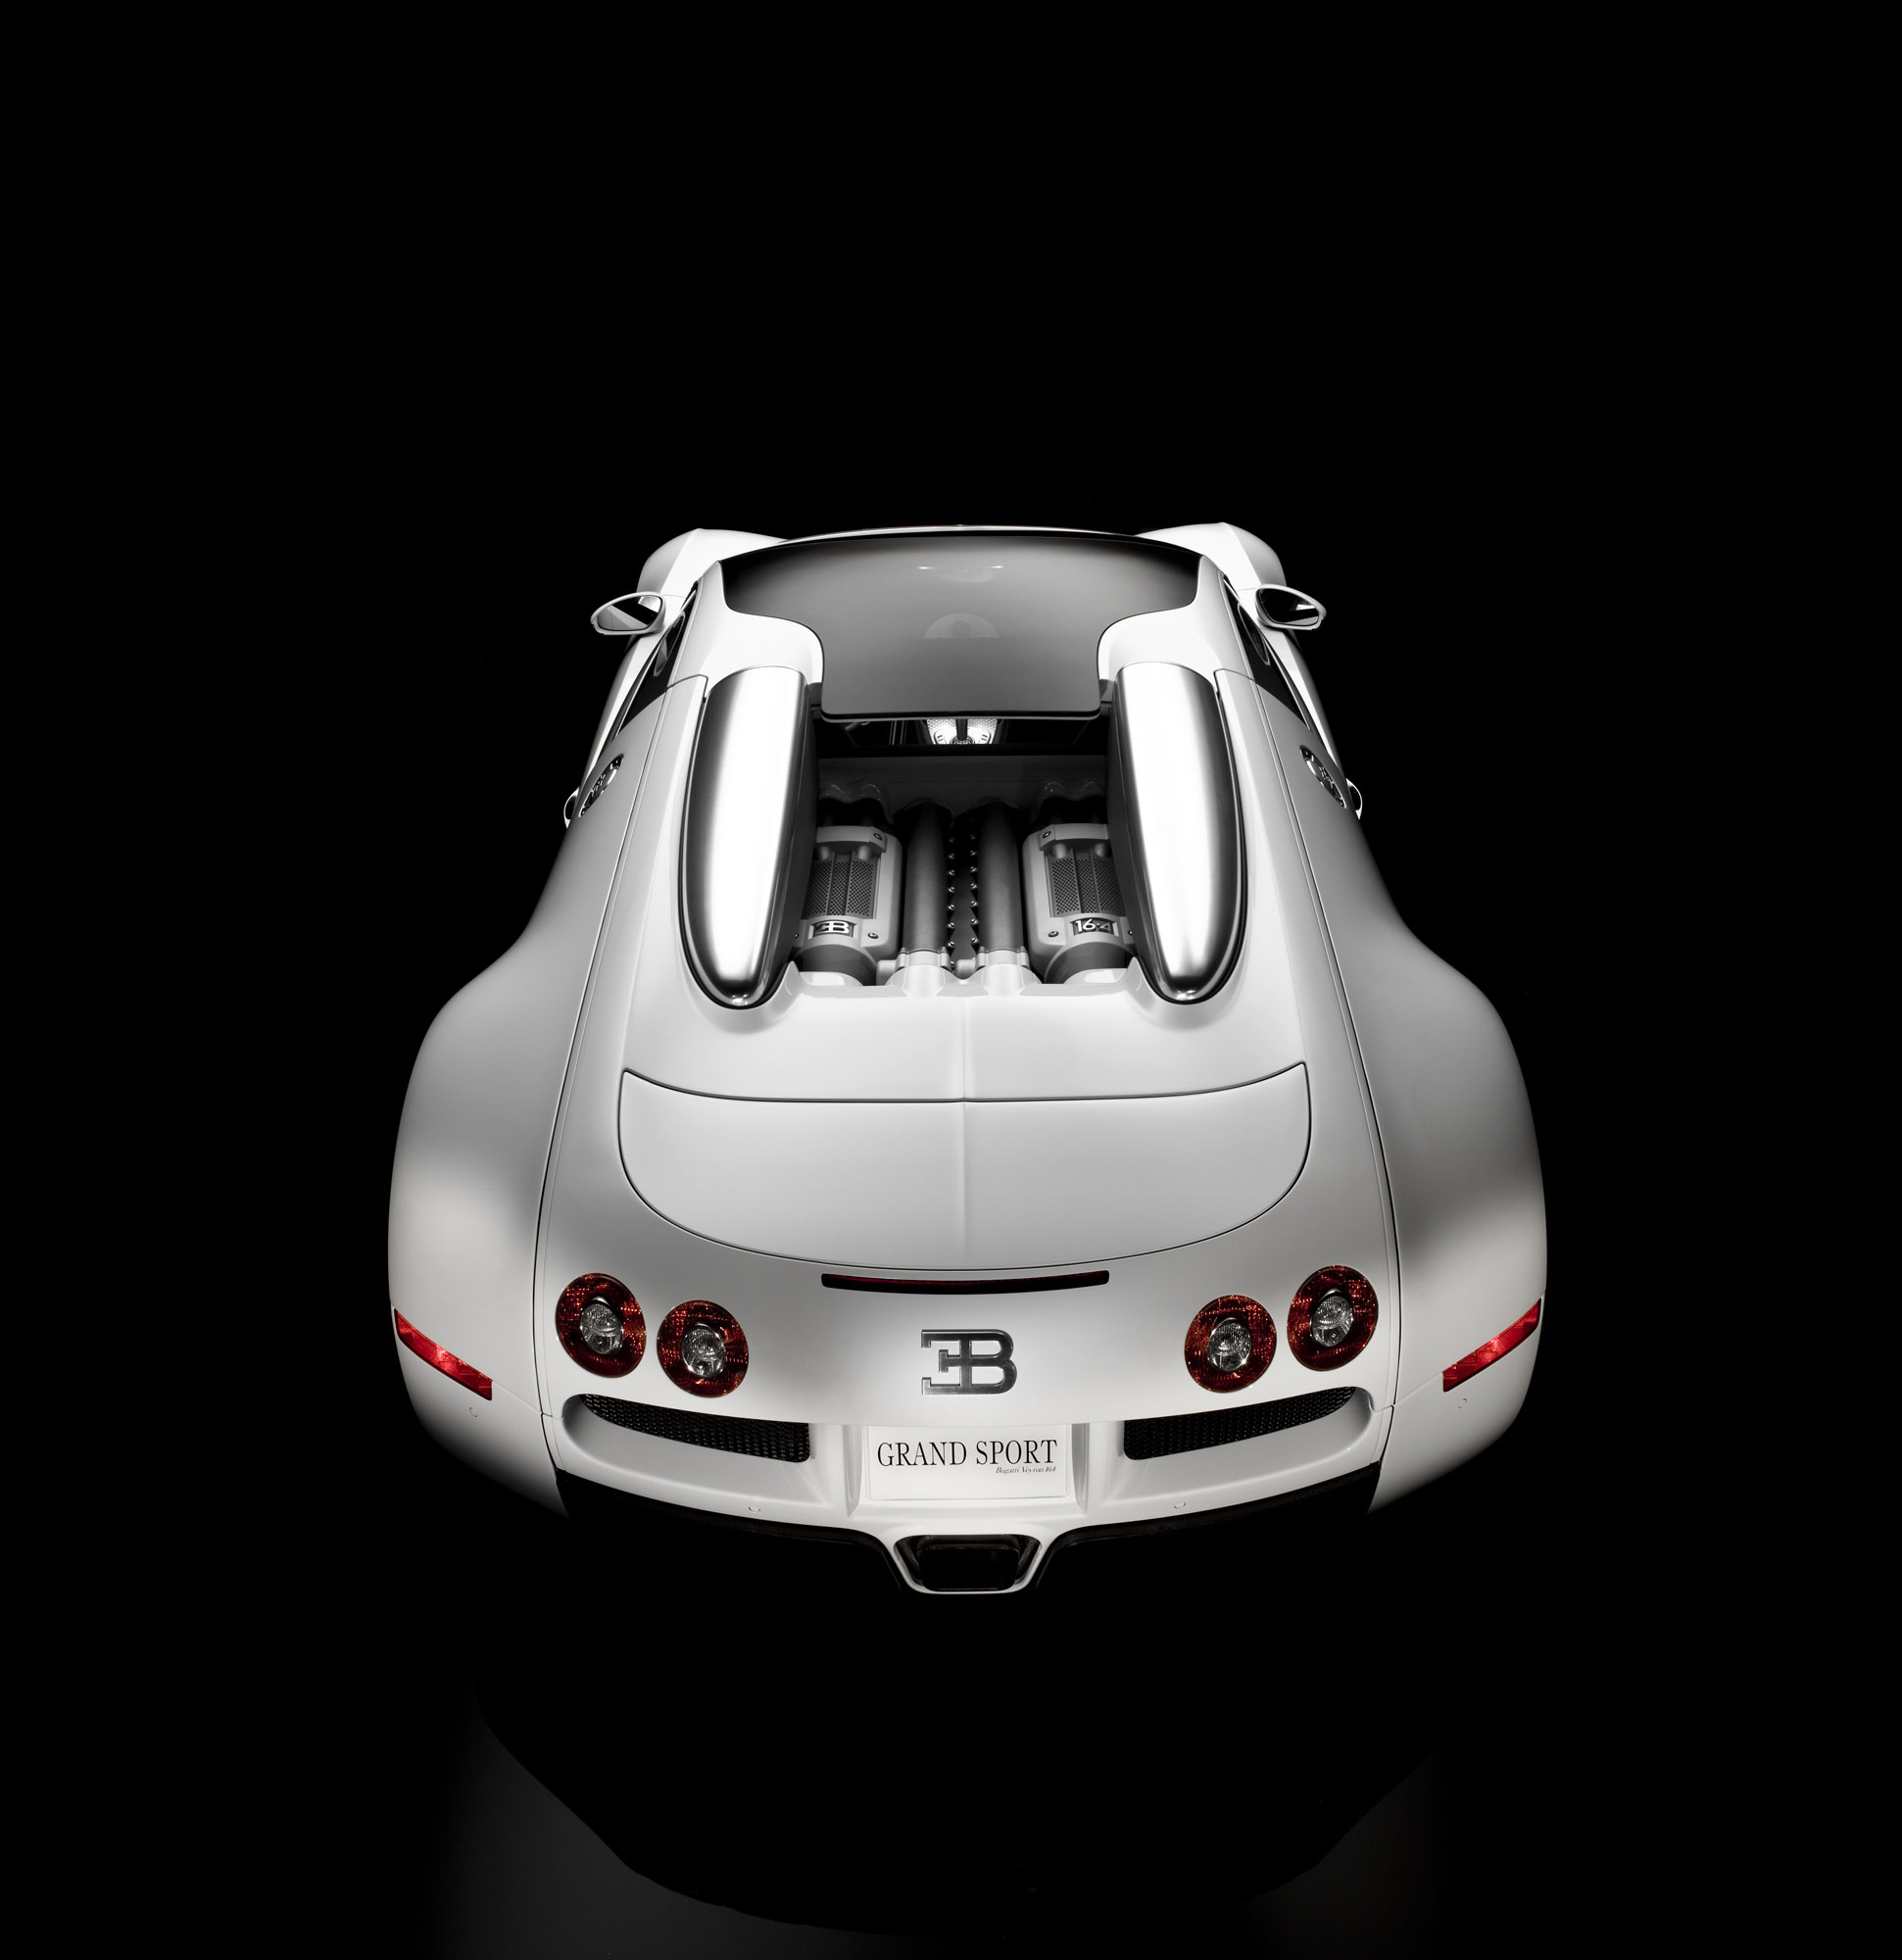 bugatti-veyron-164-grand-sport-25 Fascinating Bugatti Veyron Grand Sport Vitesse Convertible Cars Trend